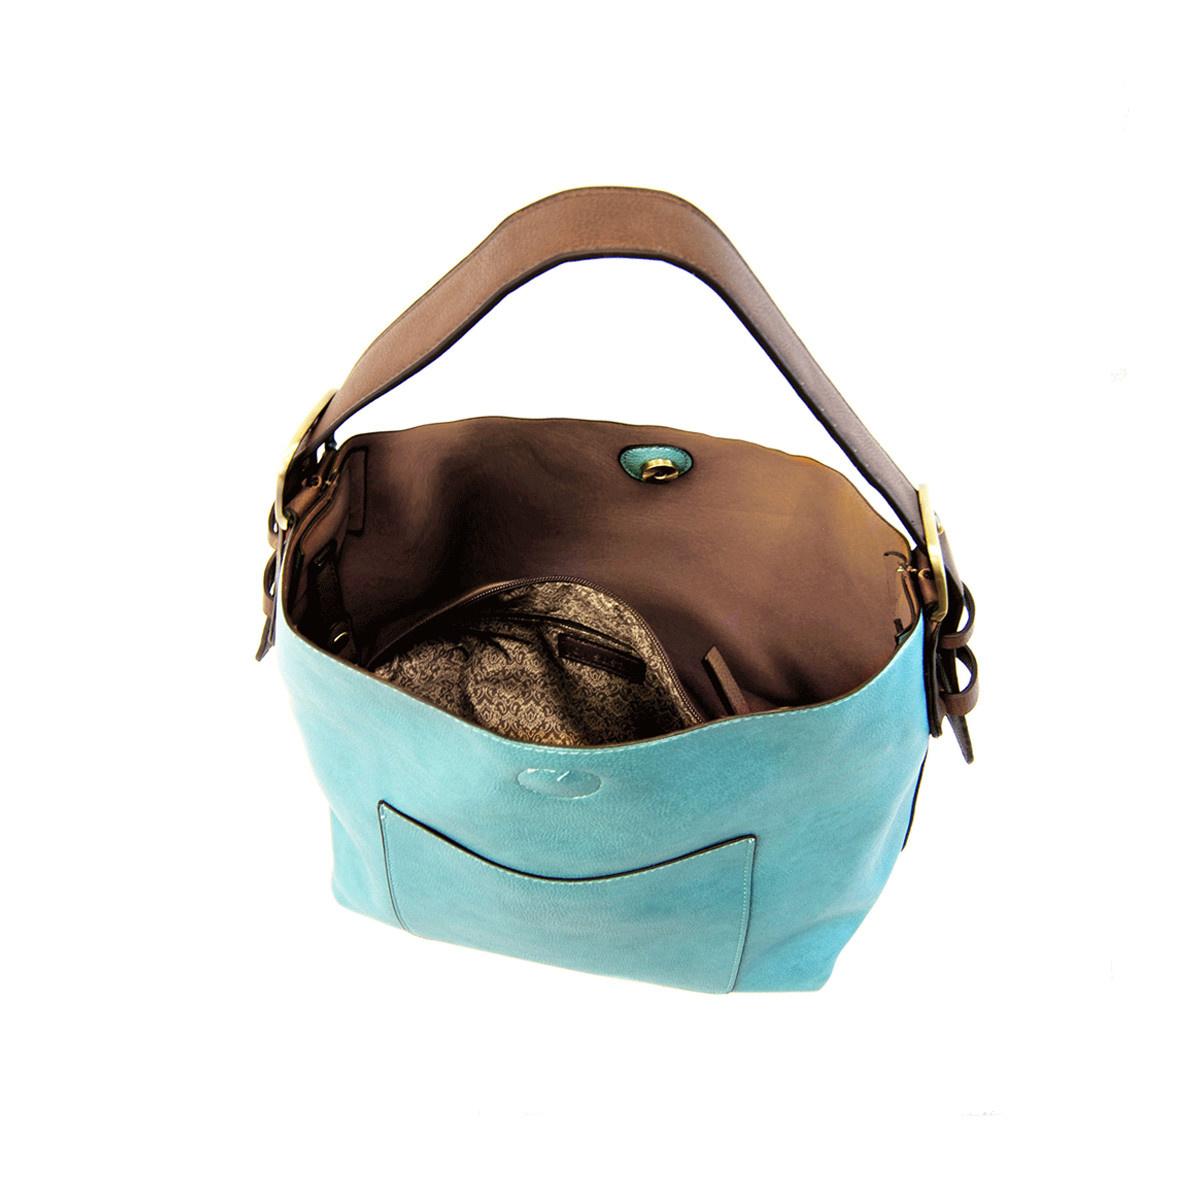 Joy Susan Joy Susan Classic Hobo Handbag turquoise